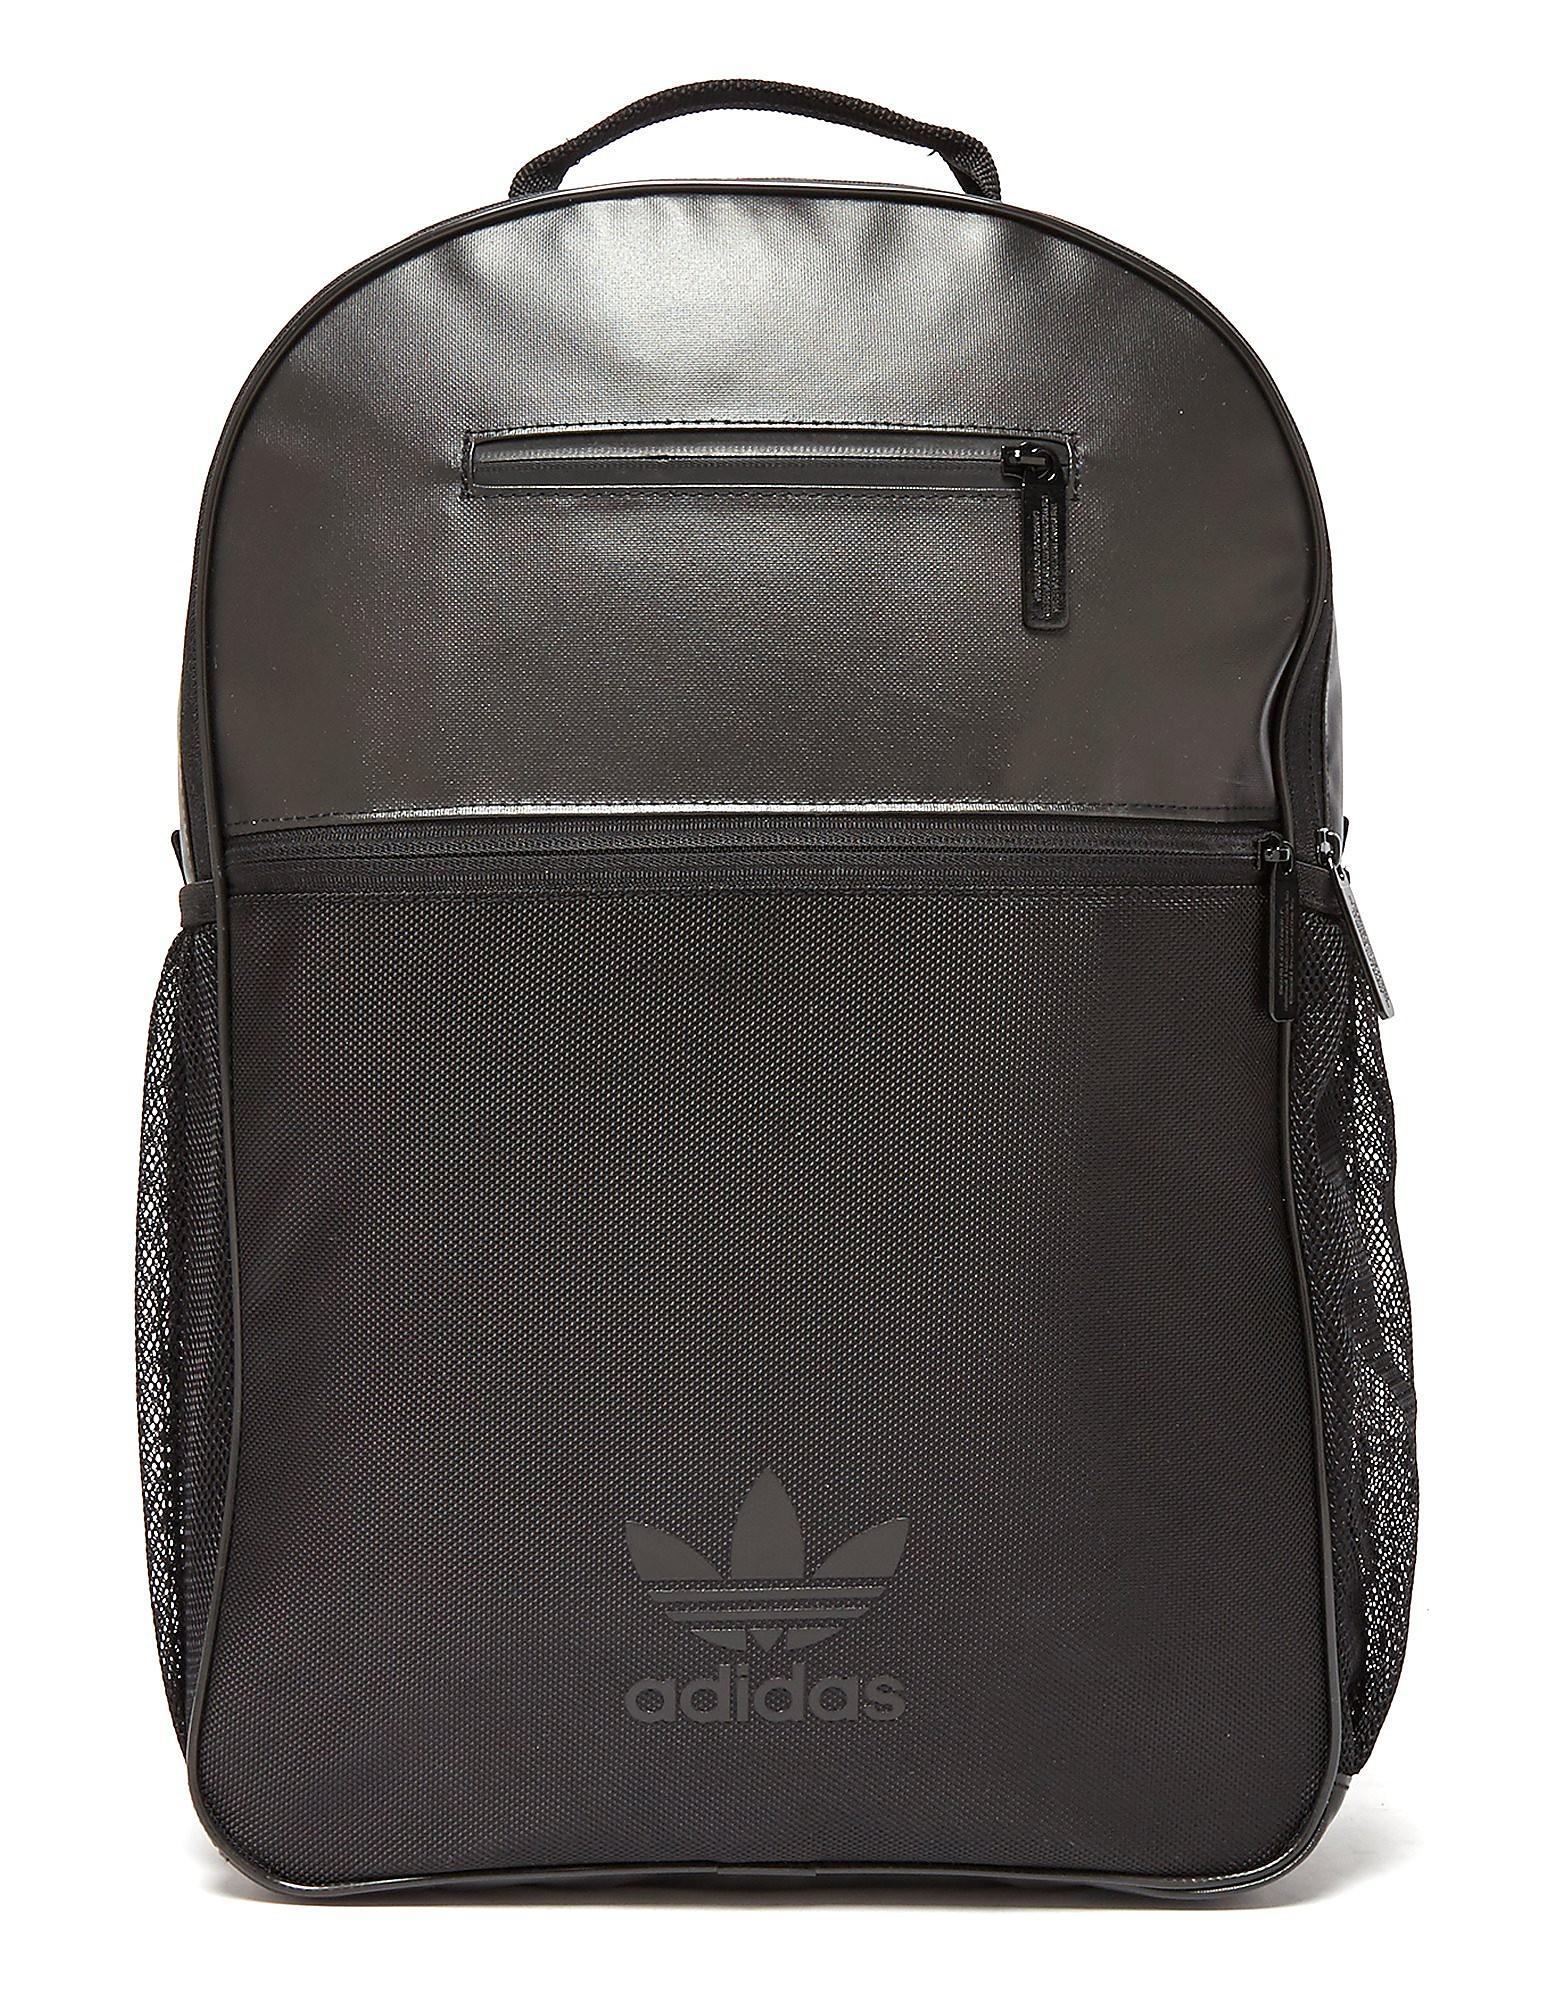 adidas Originals Essential Sport Mesh Backpack